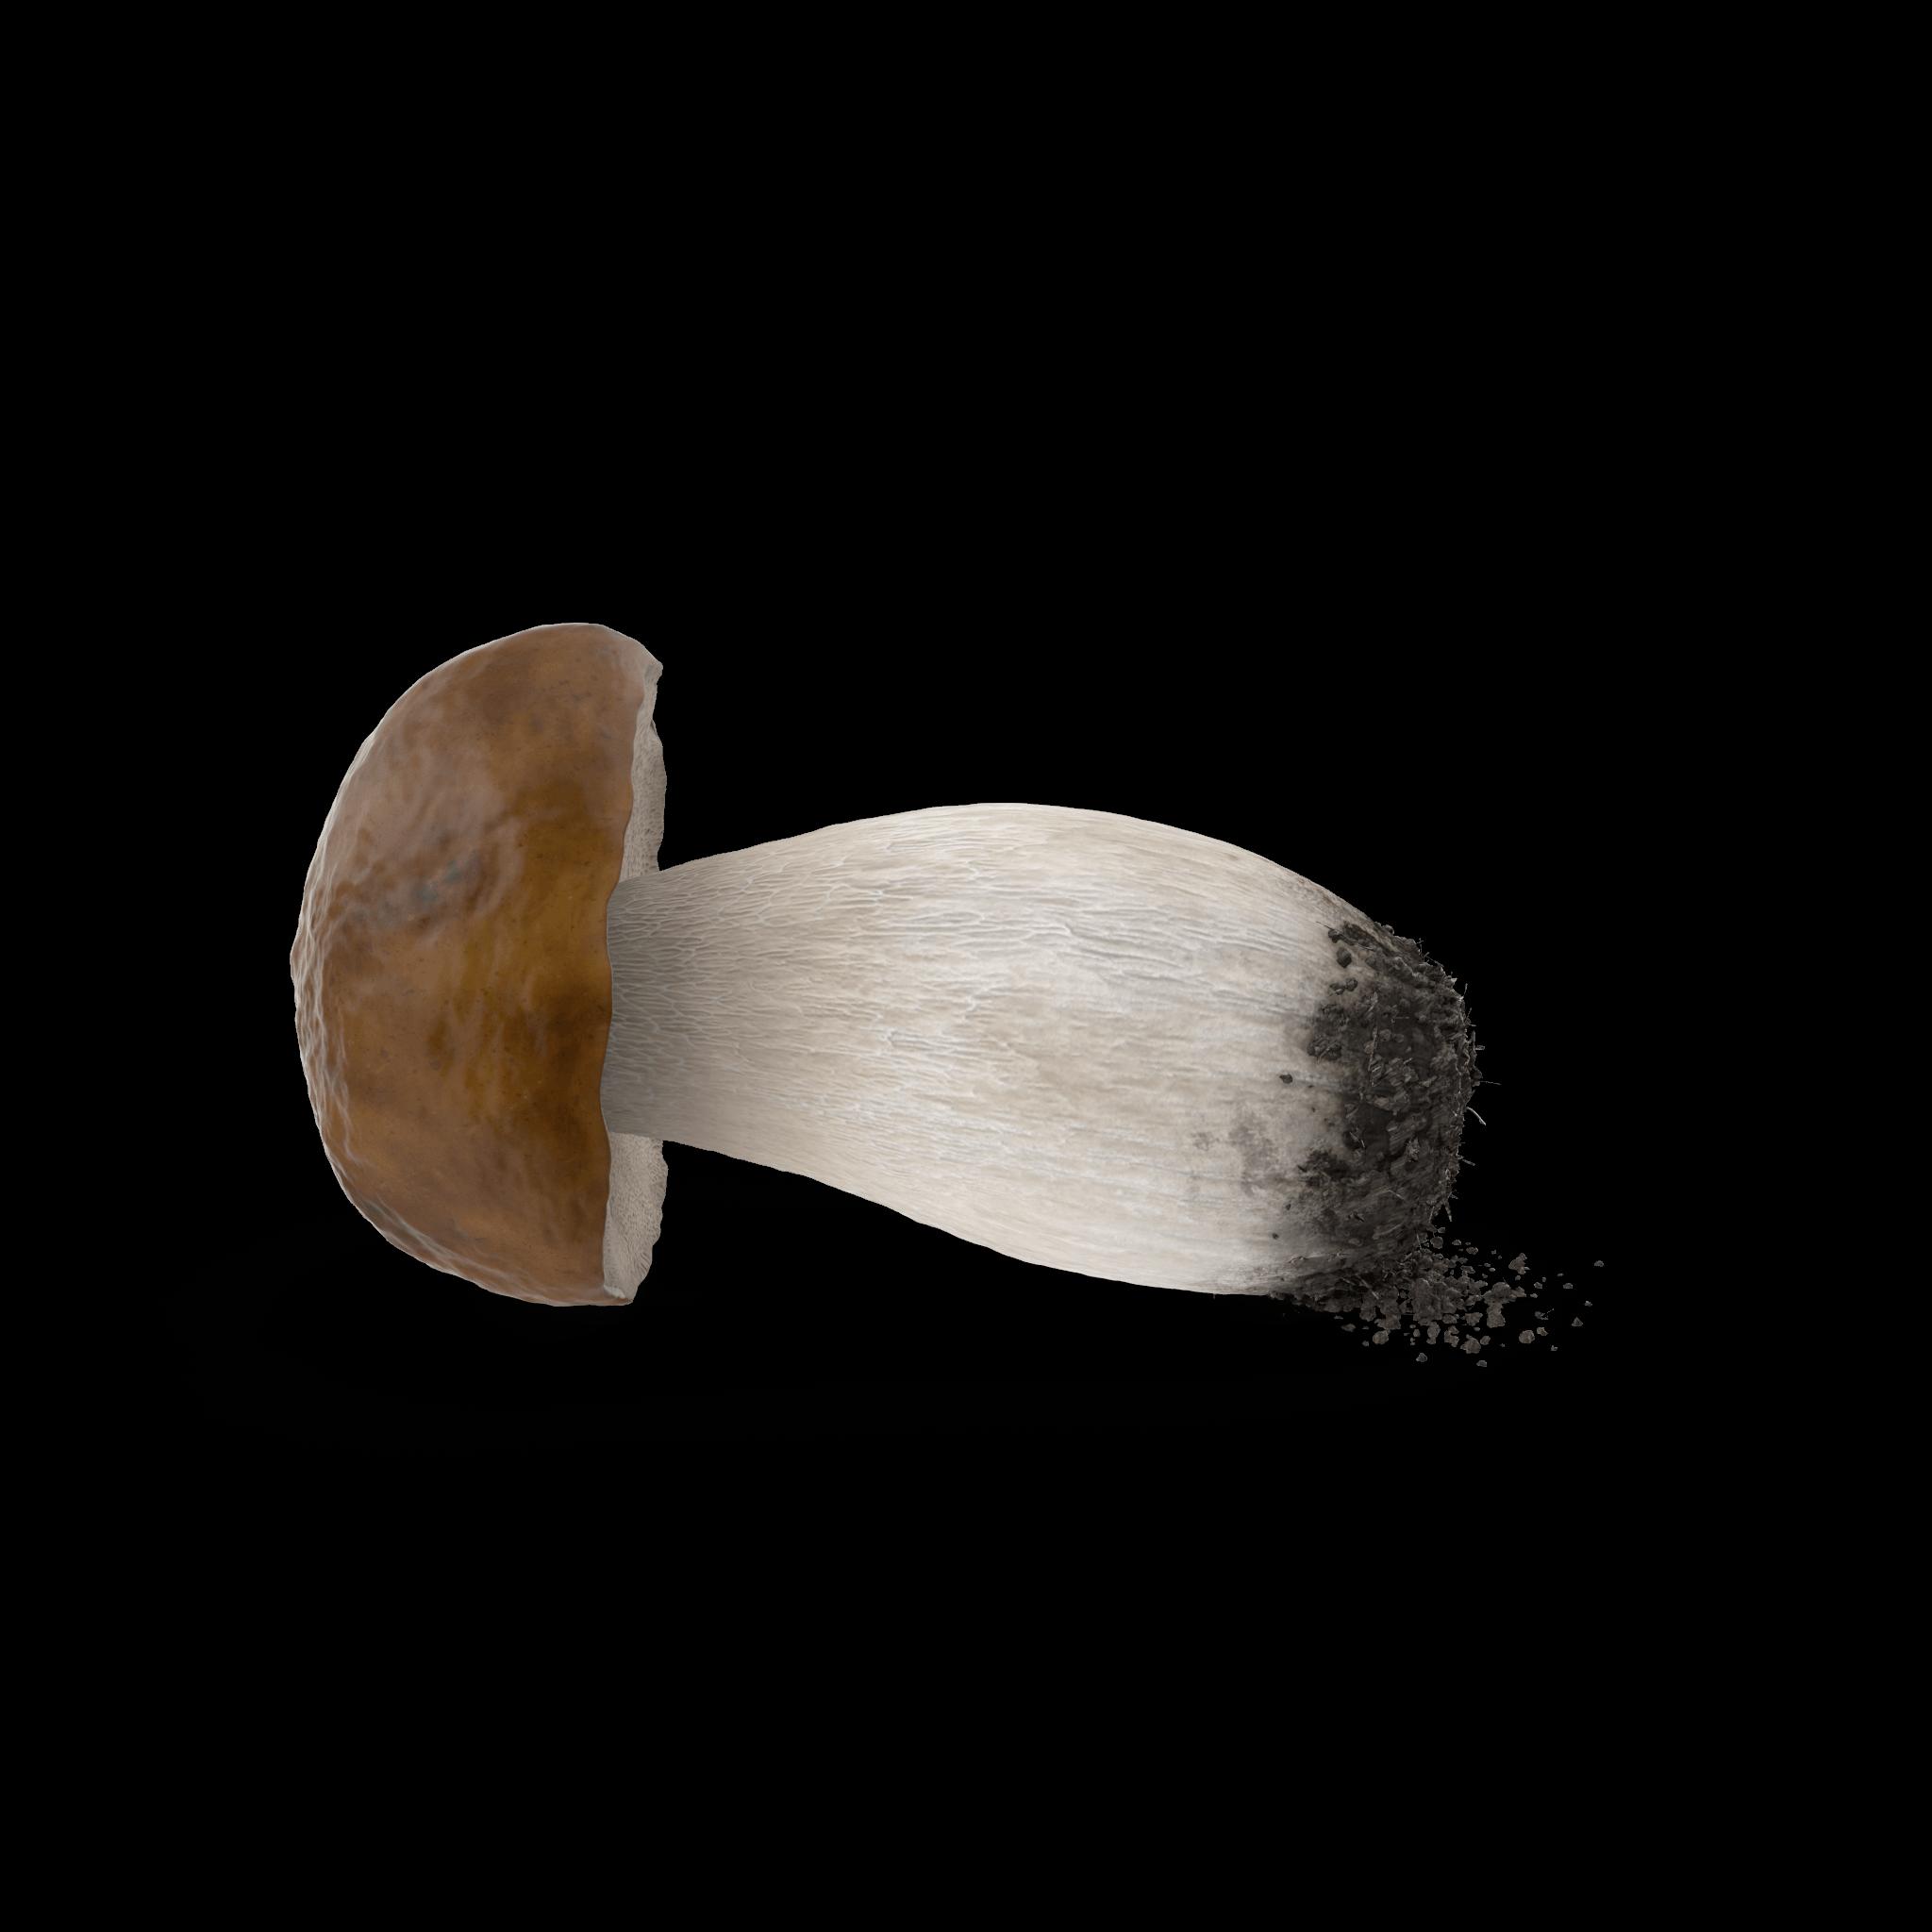 Penny Bun Mushroom.H01.2k (1)